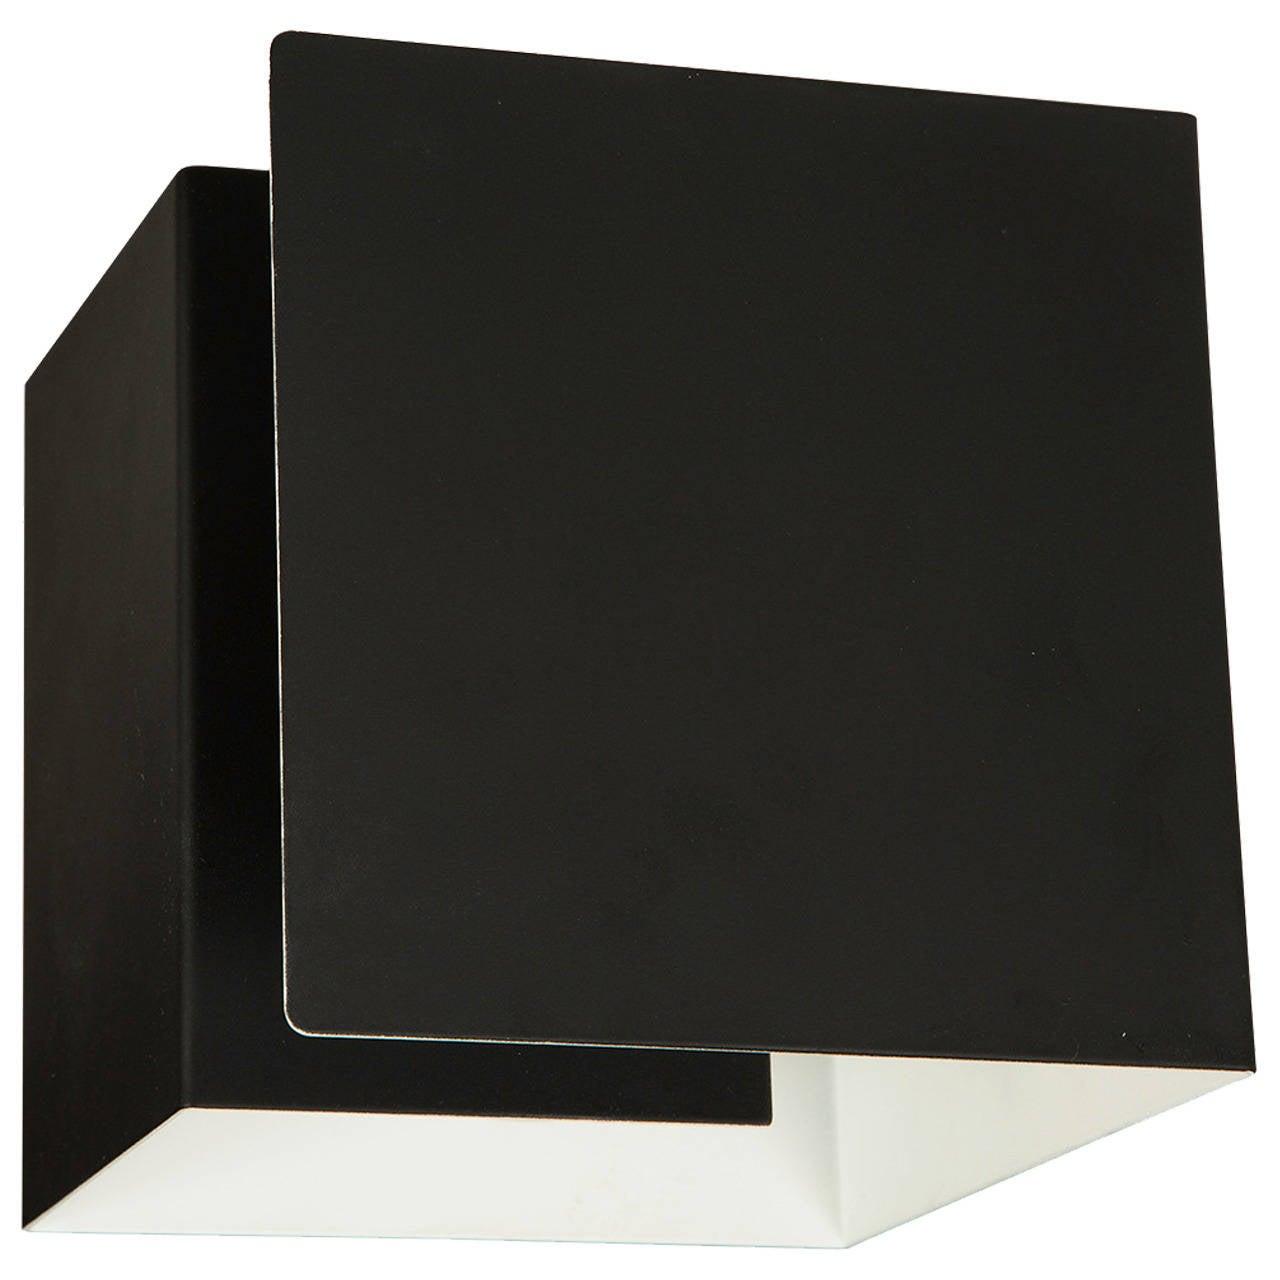 Custom Rewire Black Cube Ceiling or Wall Light